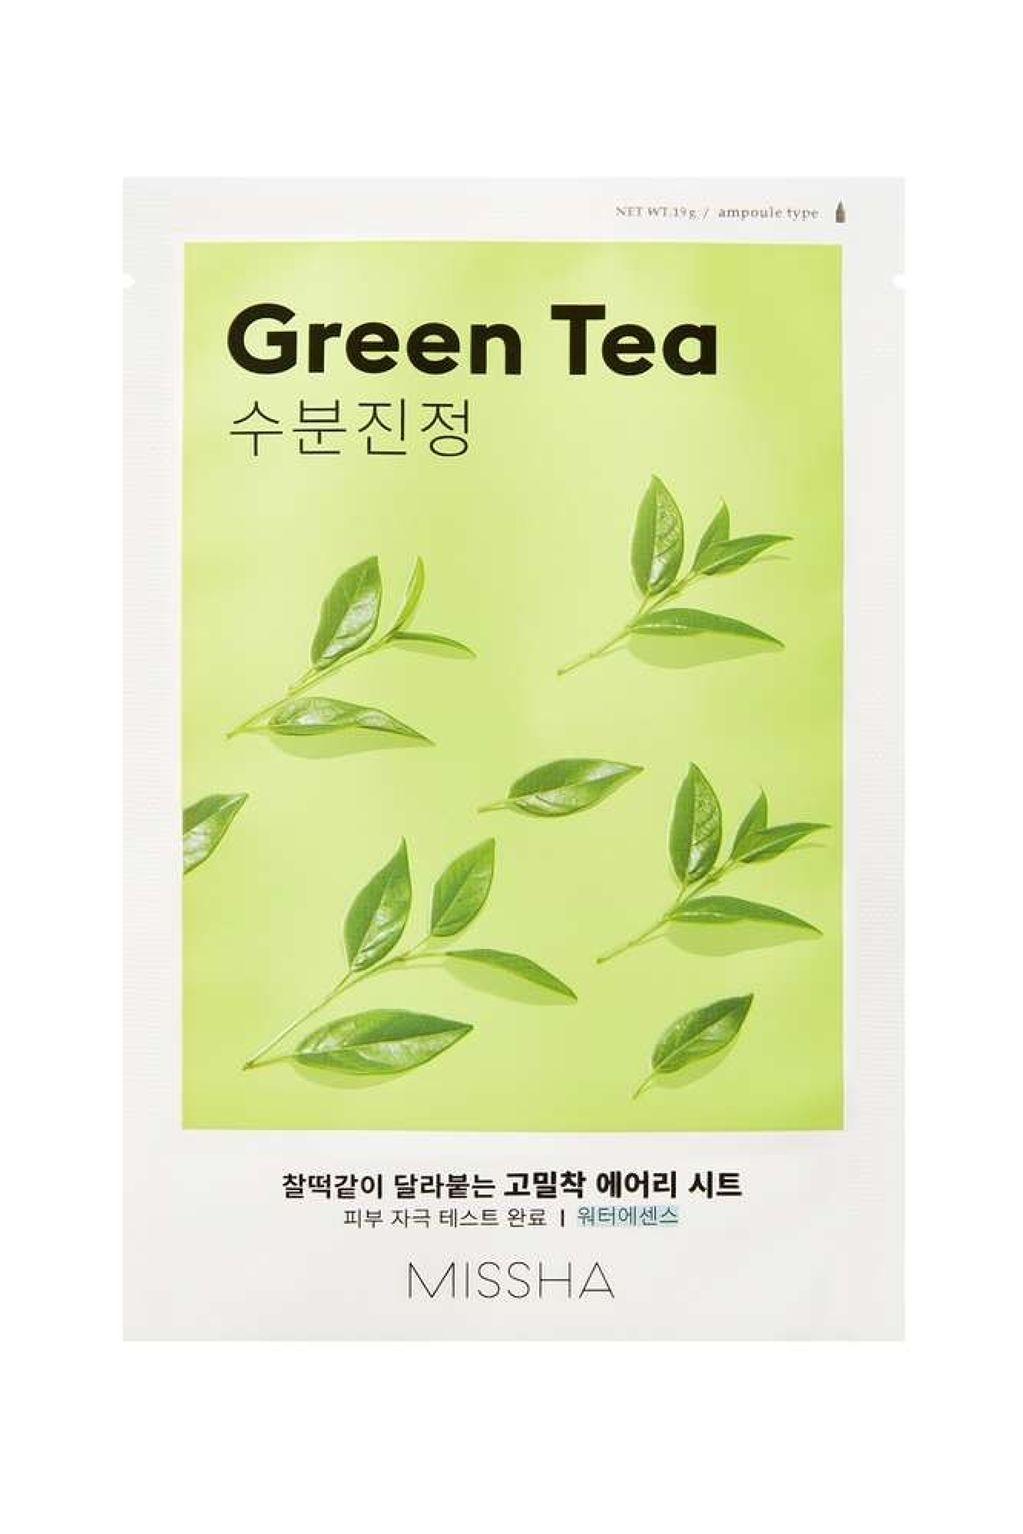 AIRY FIT SHEET MASK (GREEN TEA) - 83b76-image-tee.jpg